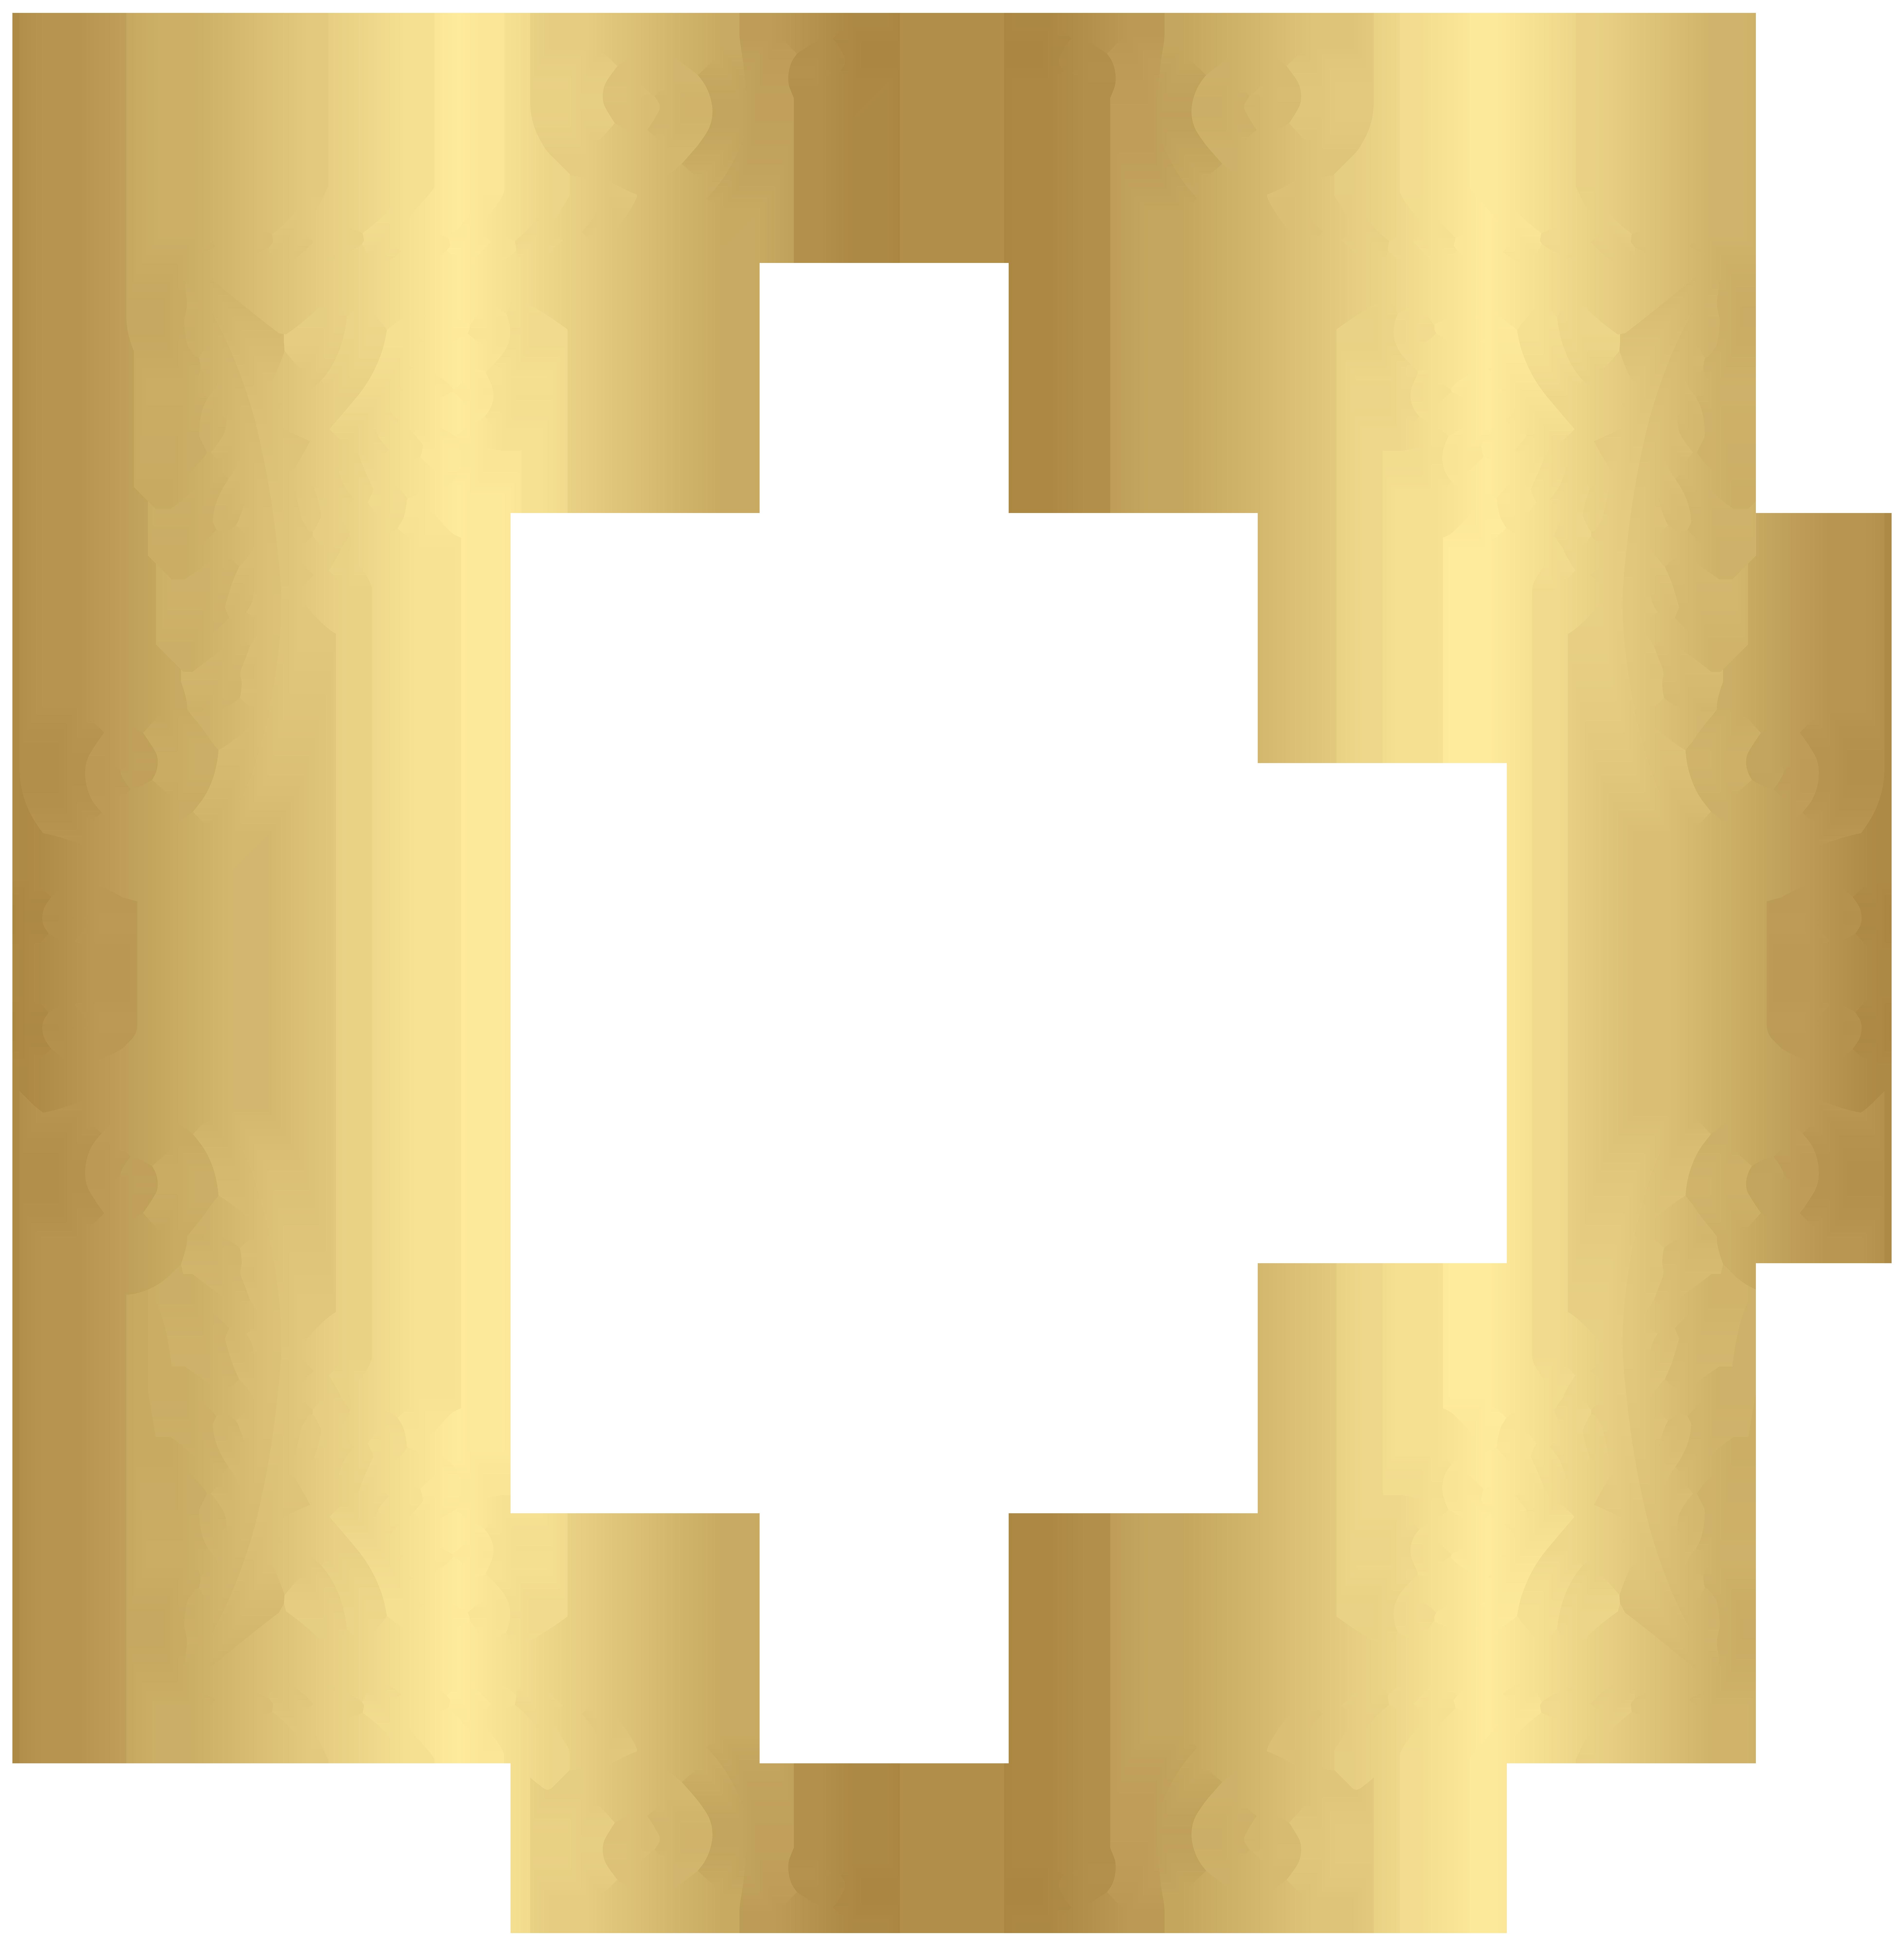 Free Golden Border Cliparts, Download Free Clip Art, Free.